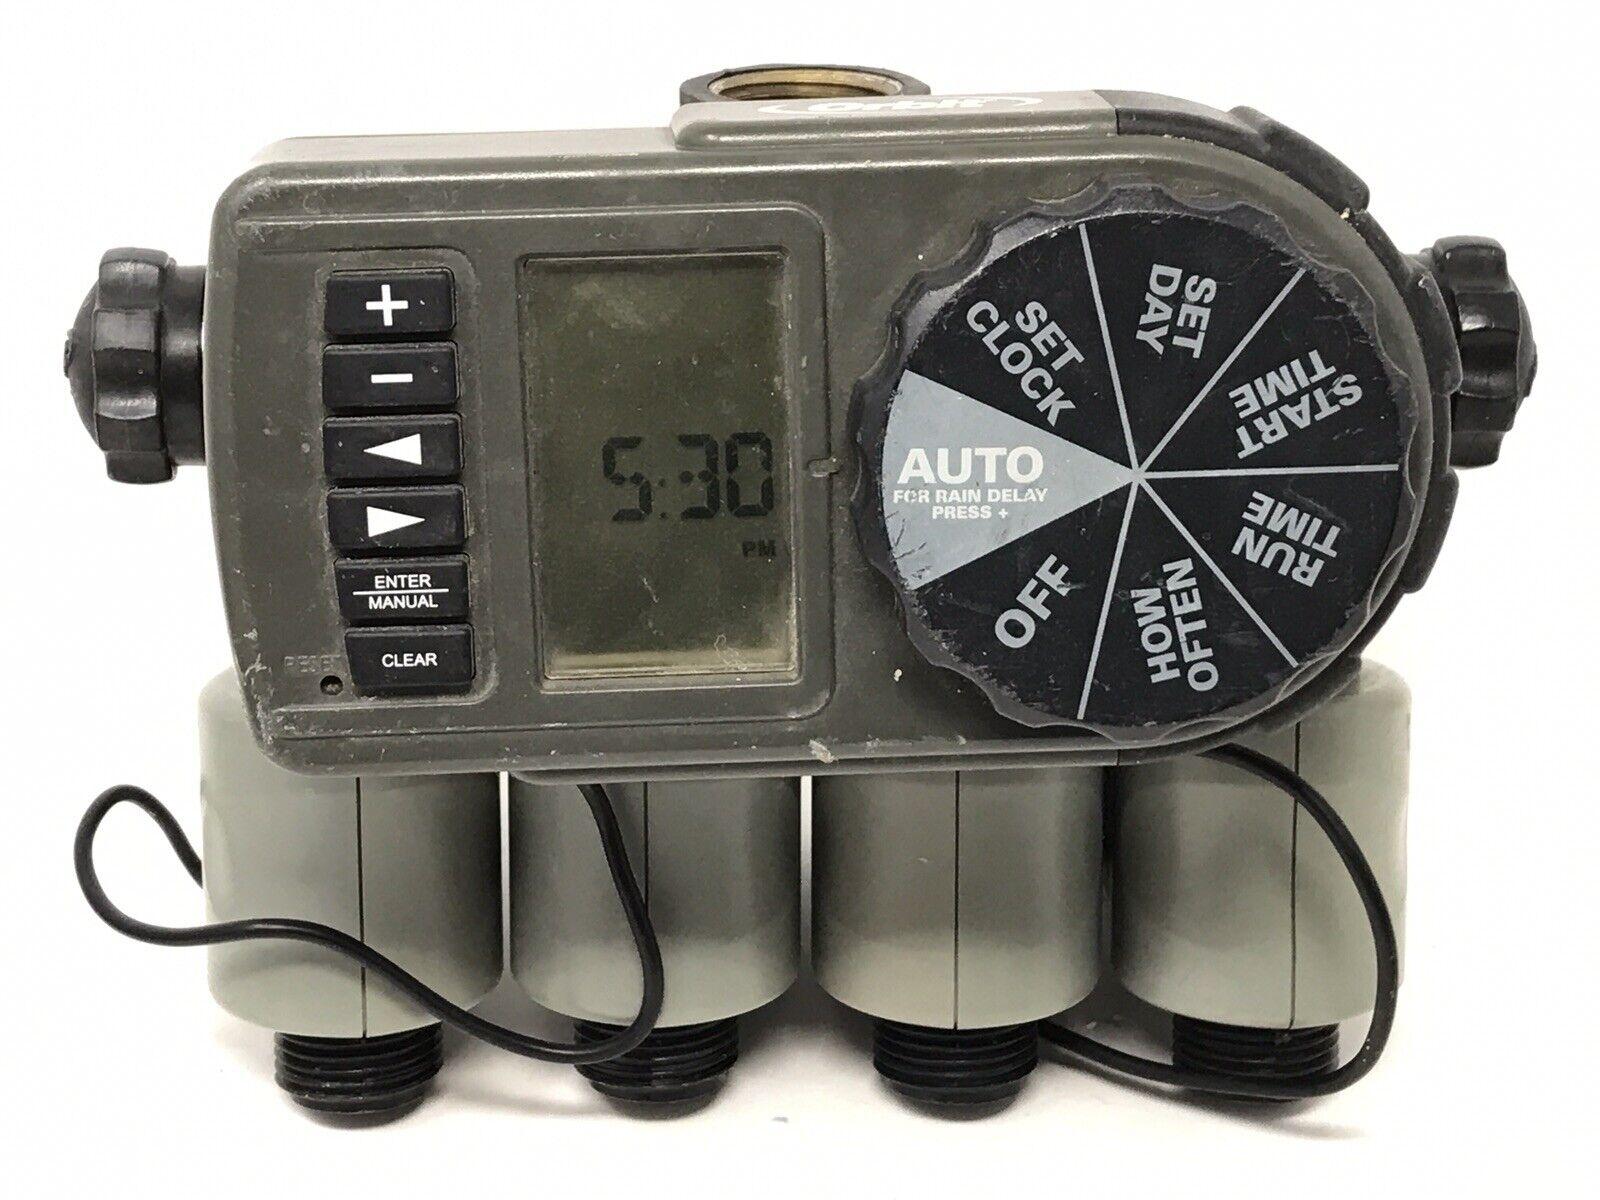 Orbit Automatic Timer Yard Watering Kit Model 56041 - Tested - Has Leaks